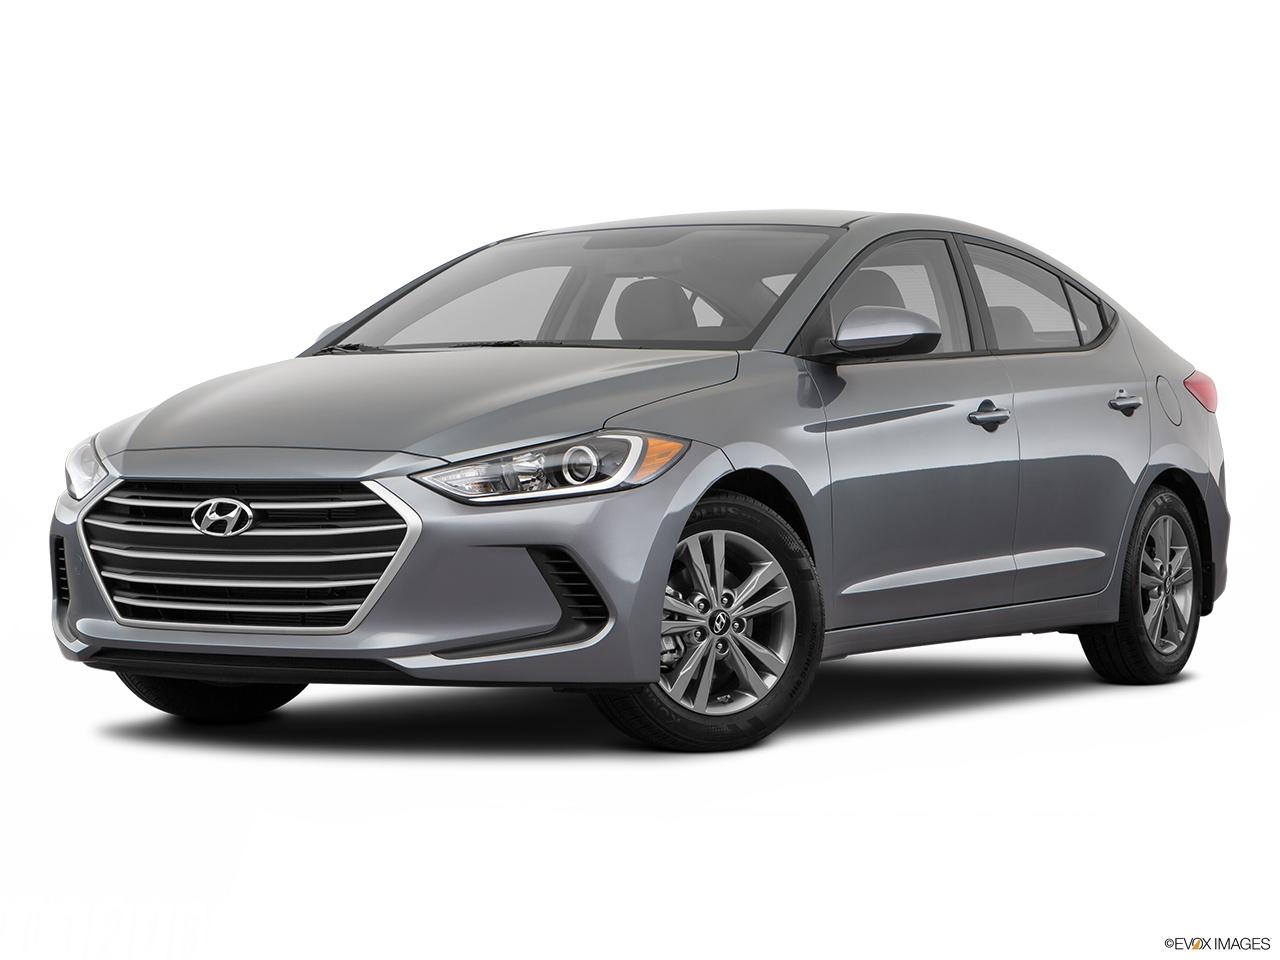 Lease A 2018 Hyundai Elantra Le Automatic 2wd In Canada